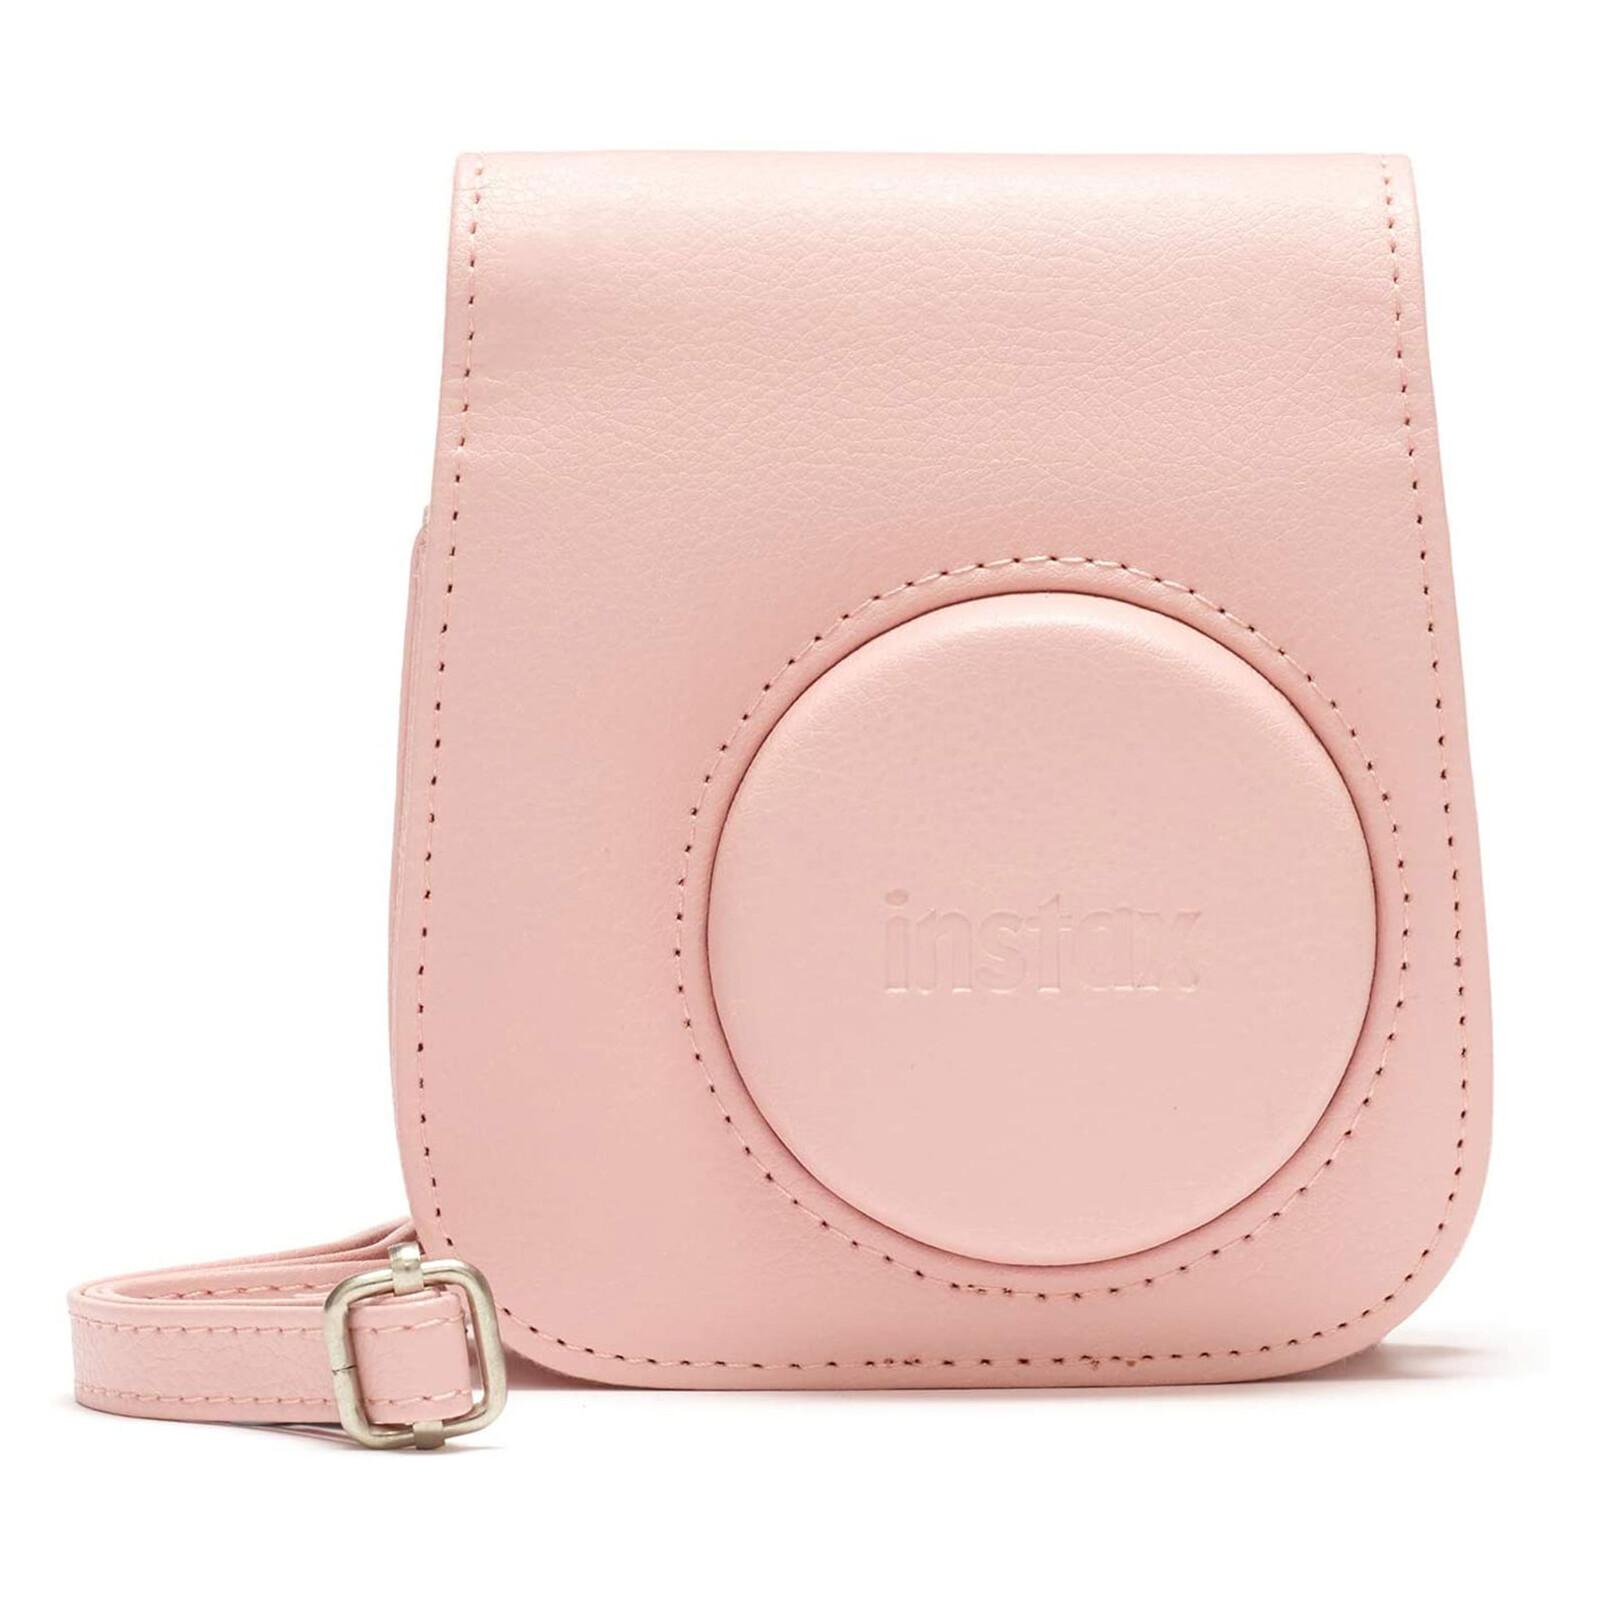 Fujifilm Instax Mini 11 Case Blush Pink